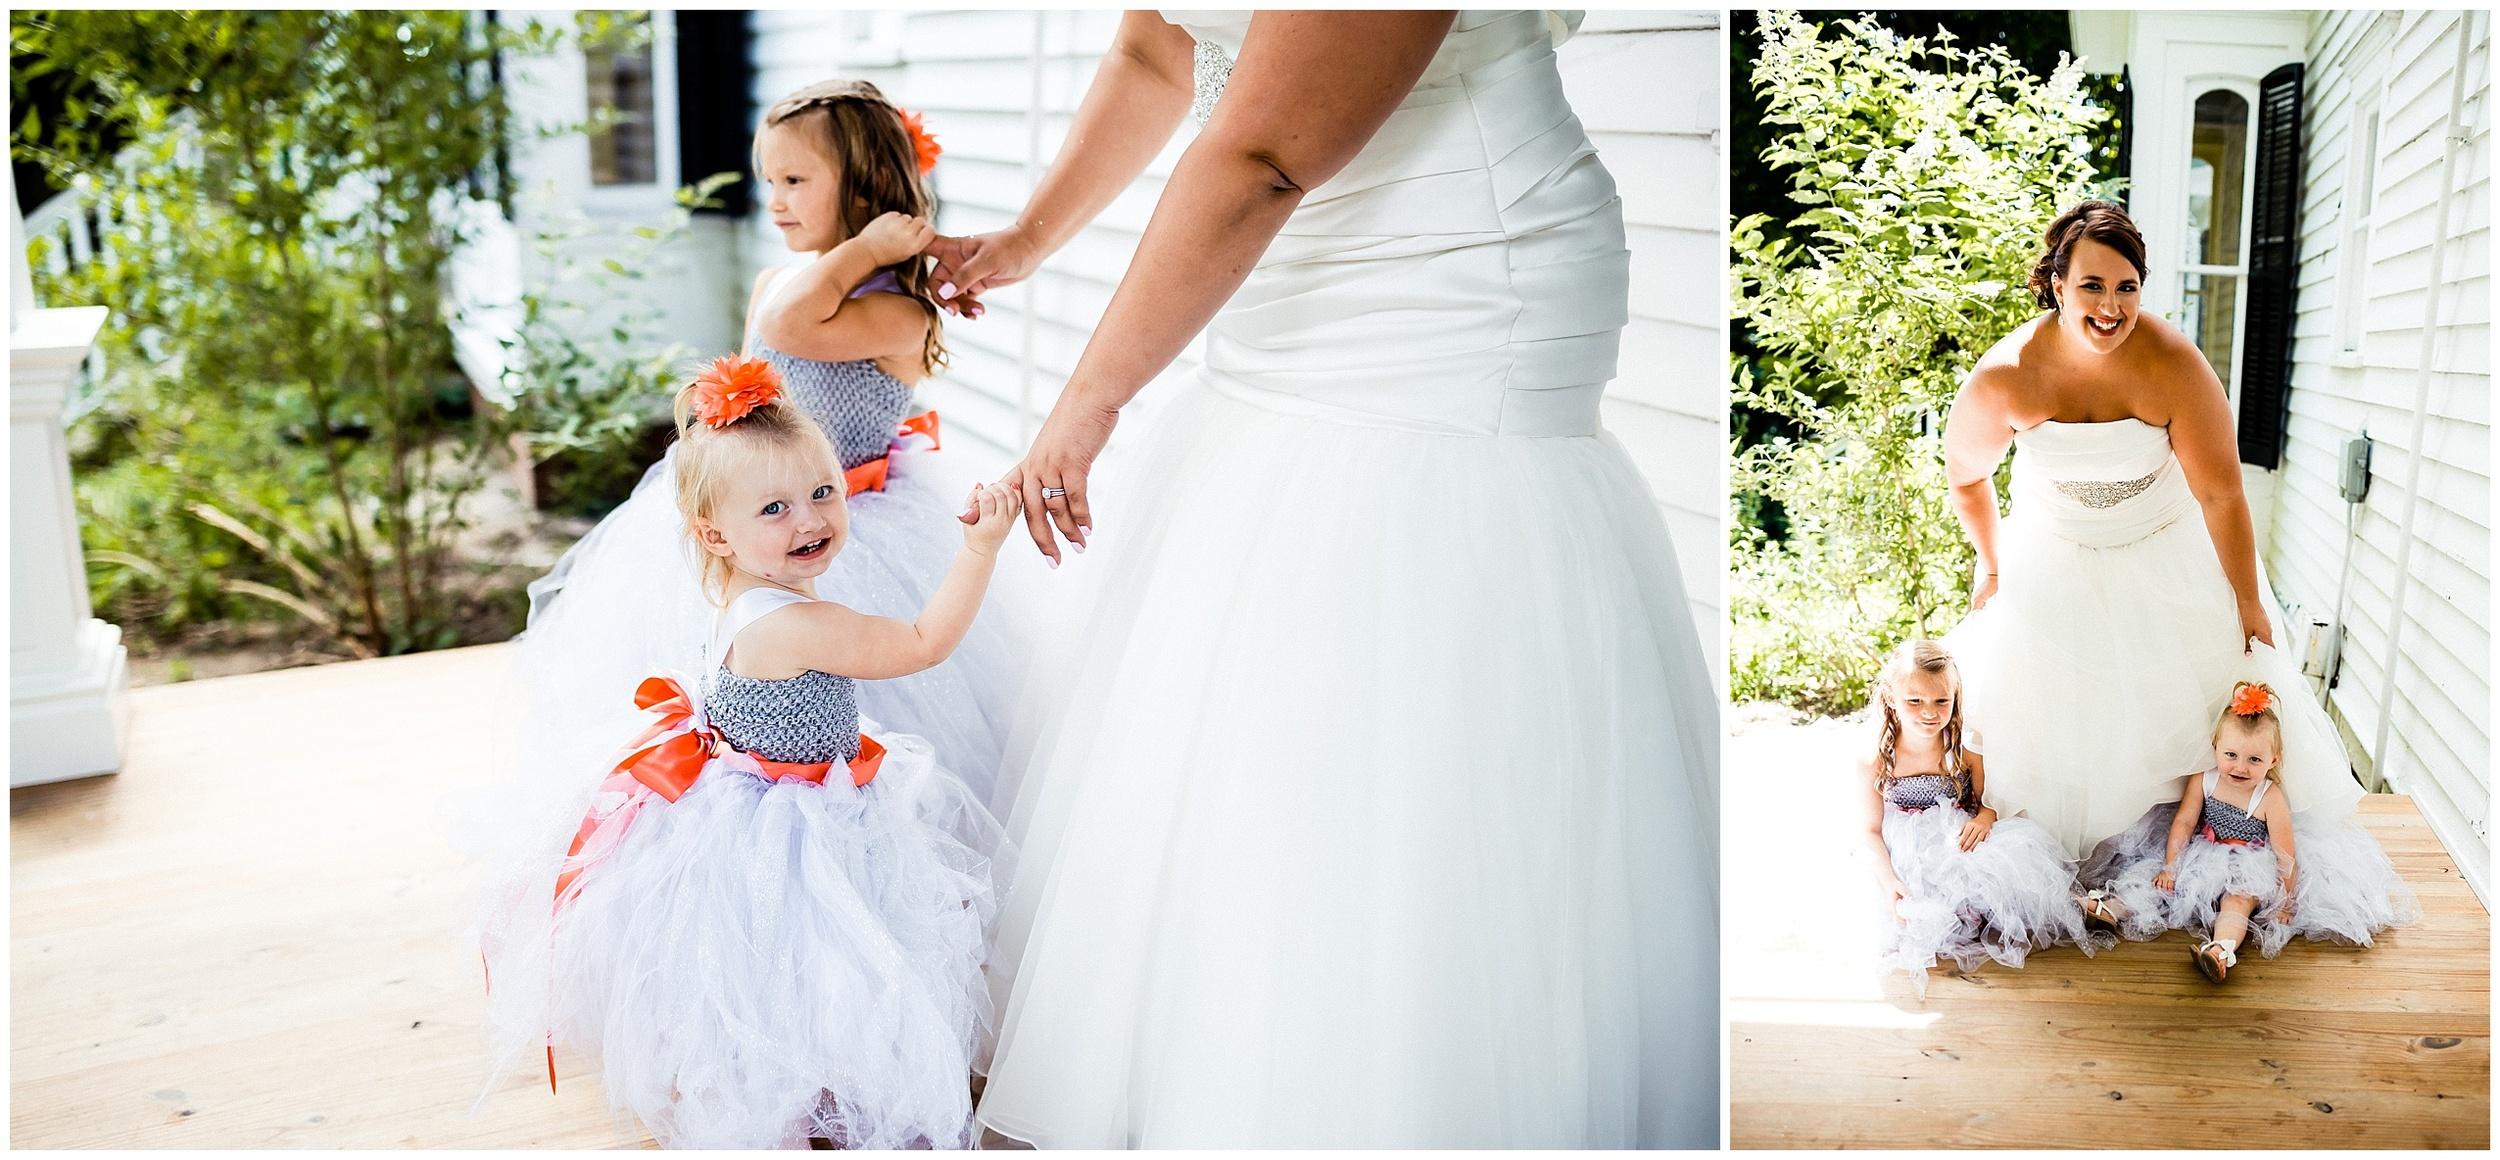 Josh + Ashley   Just Married #kyleepaigephotography_0439.jpg